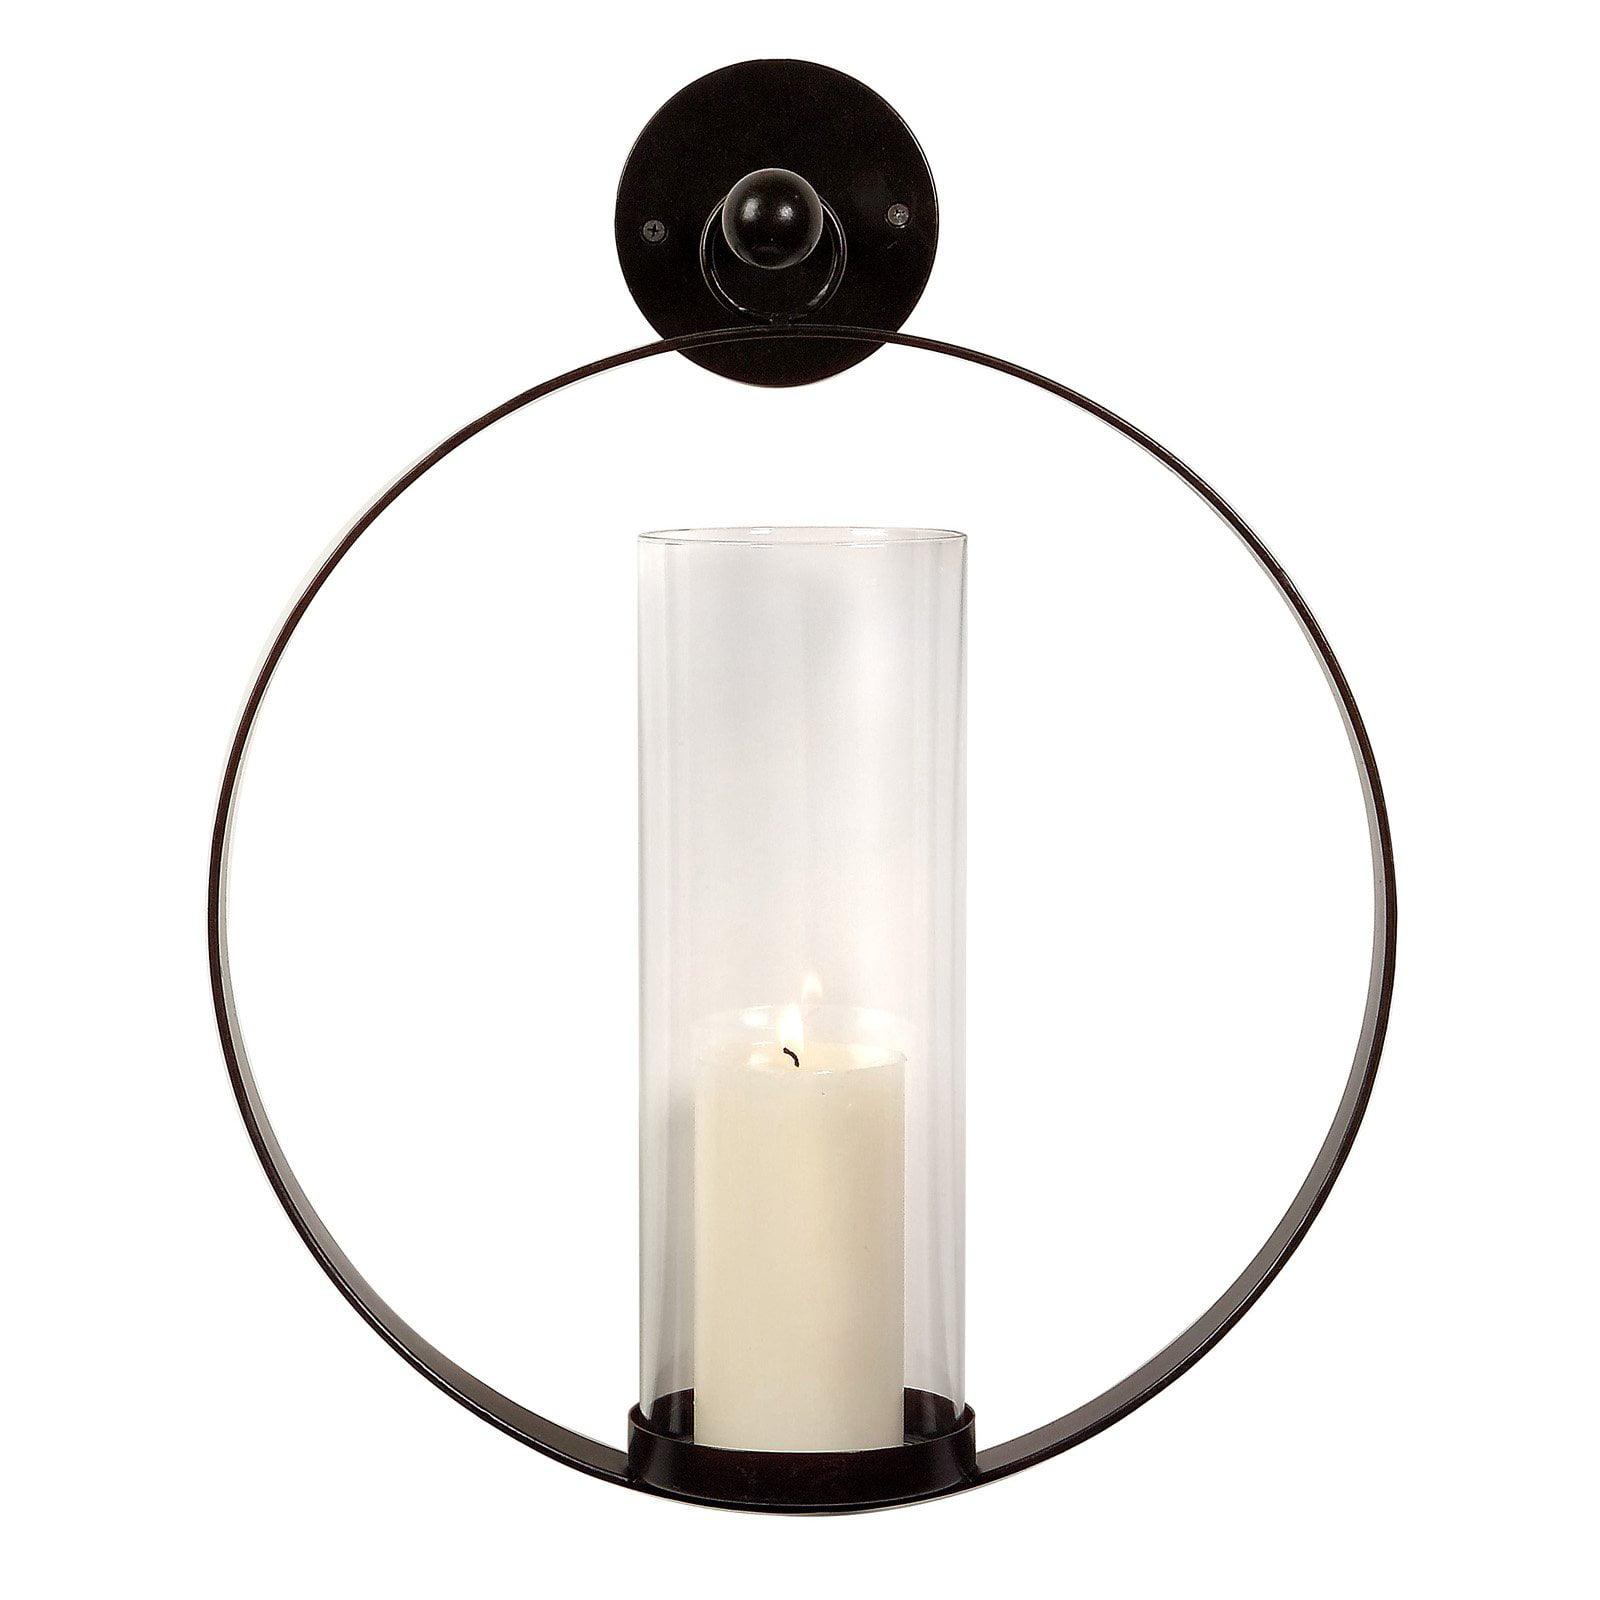 Imax Circle Metal Candle Wall Sconce Walmart Com